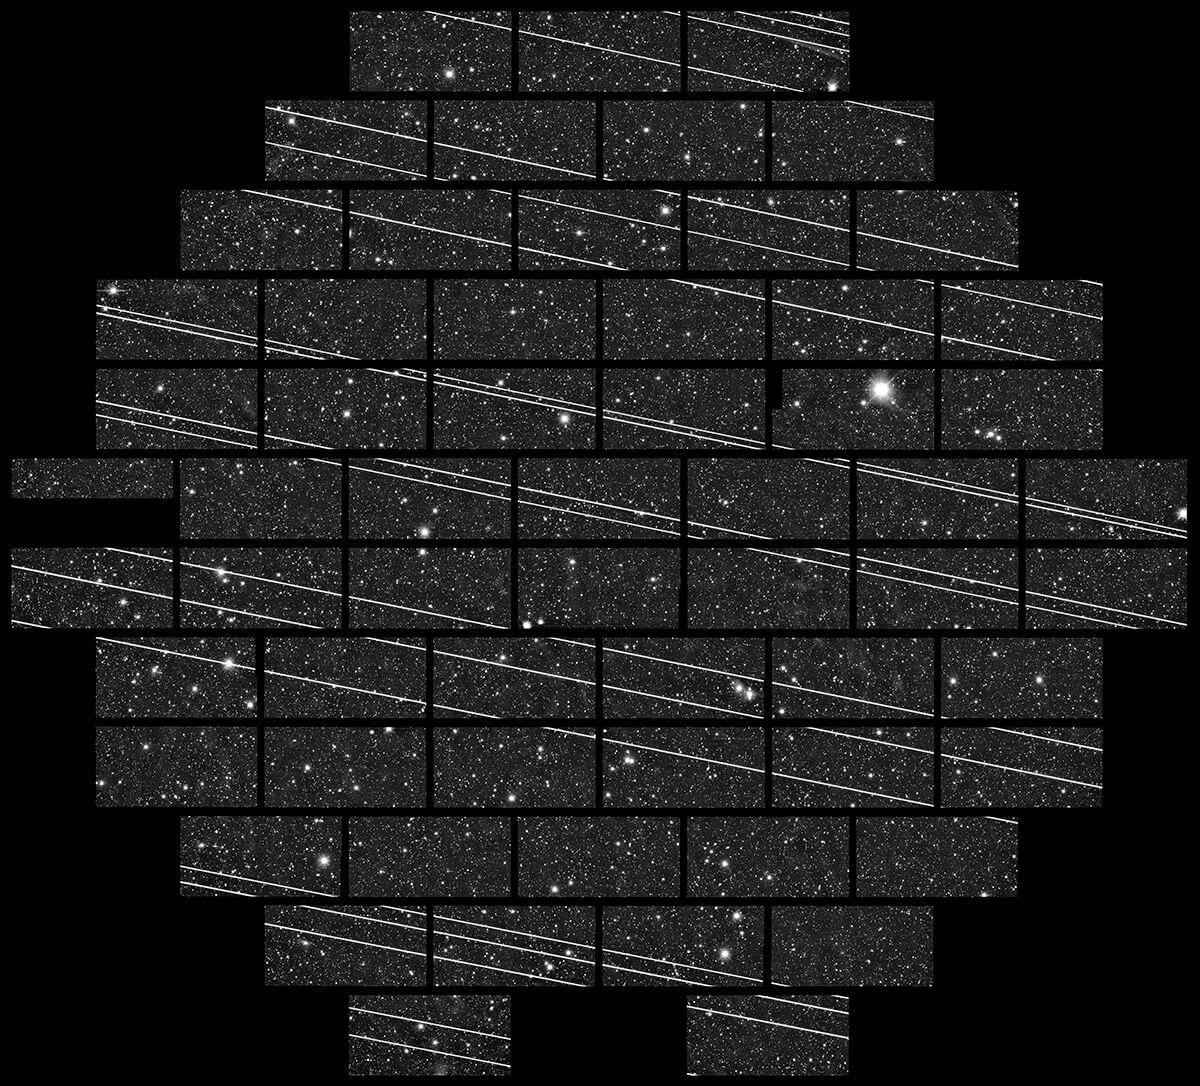 Streaks of lines on a night sky.